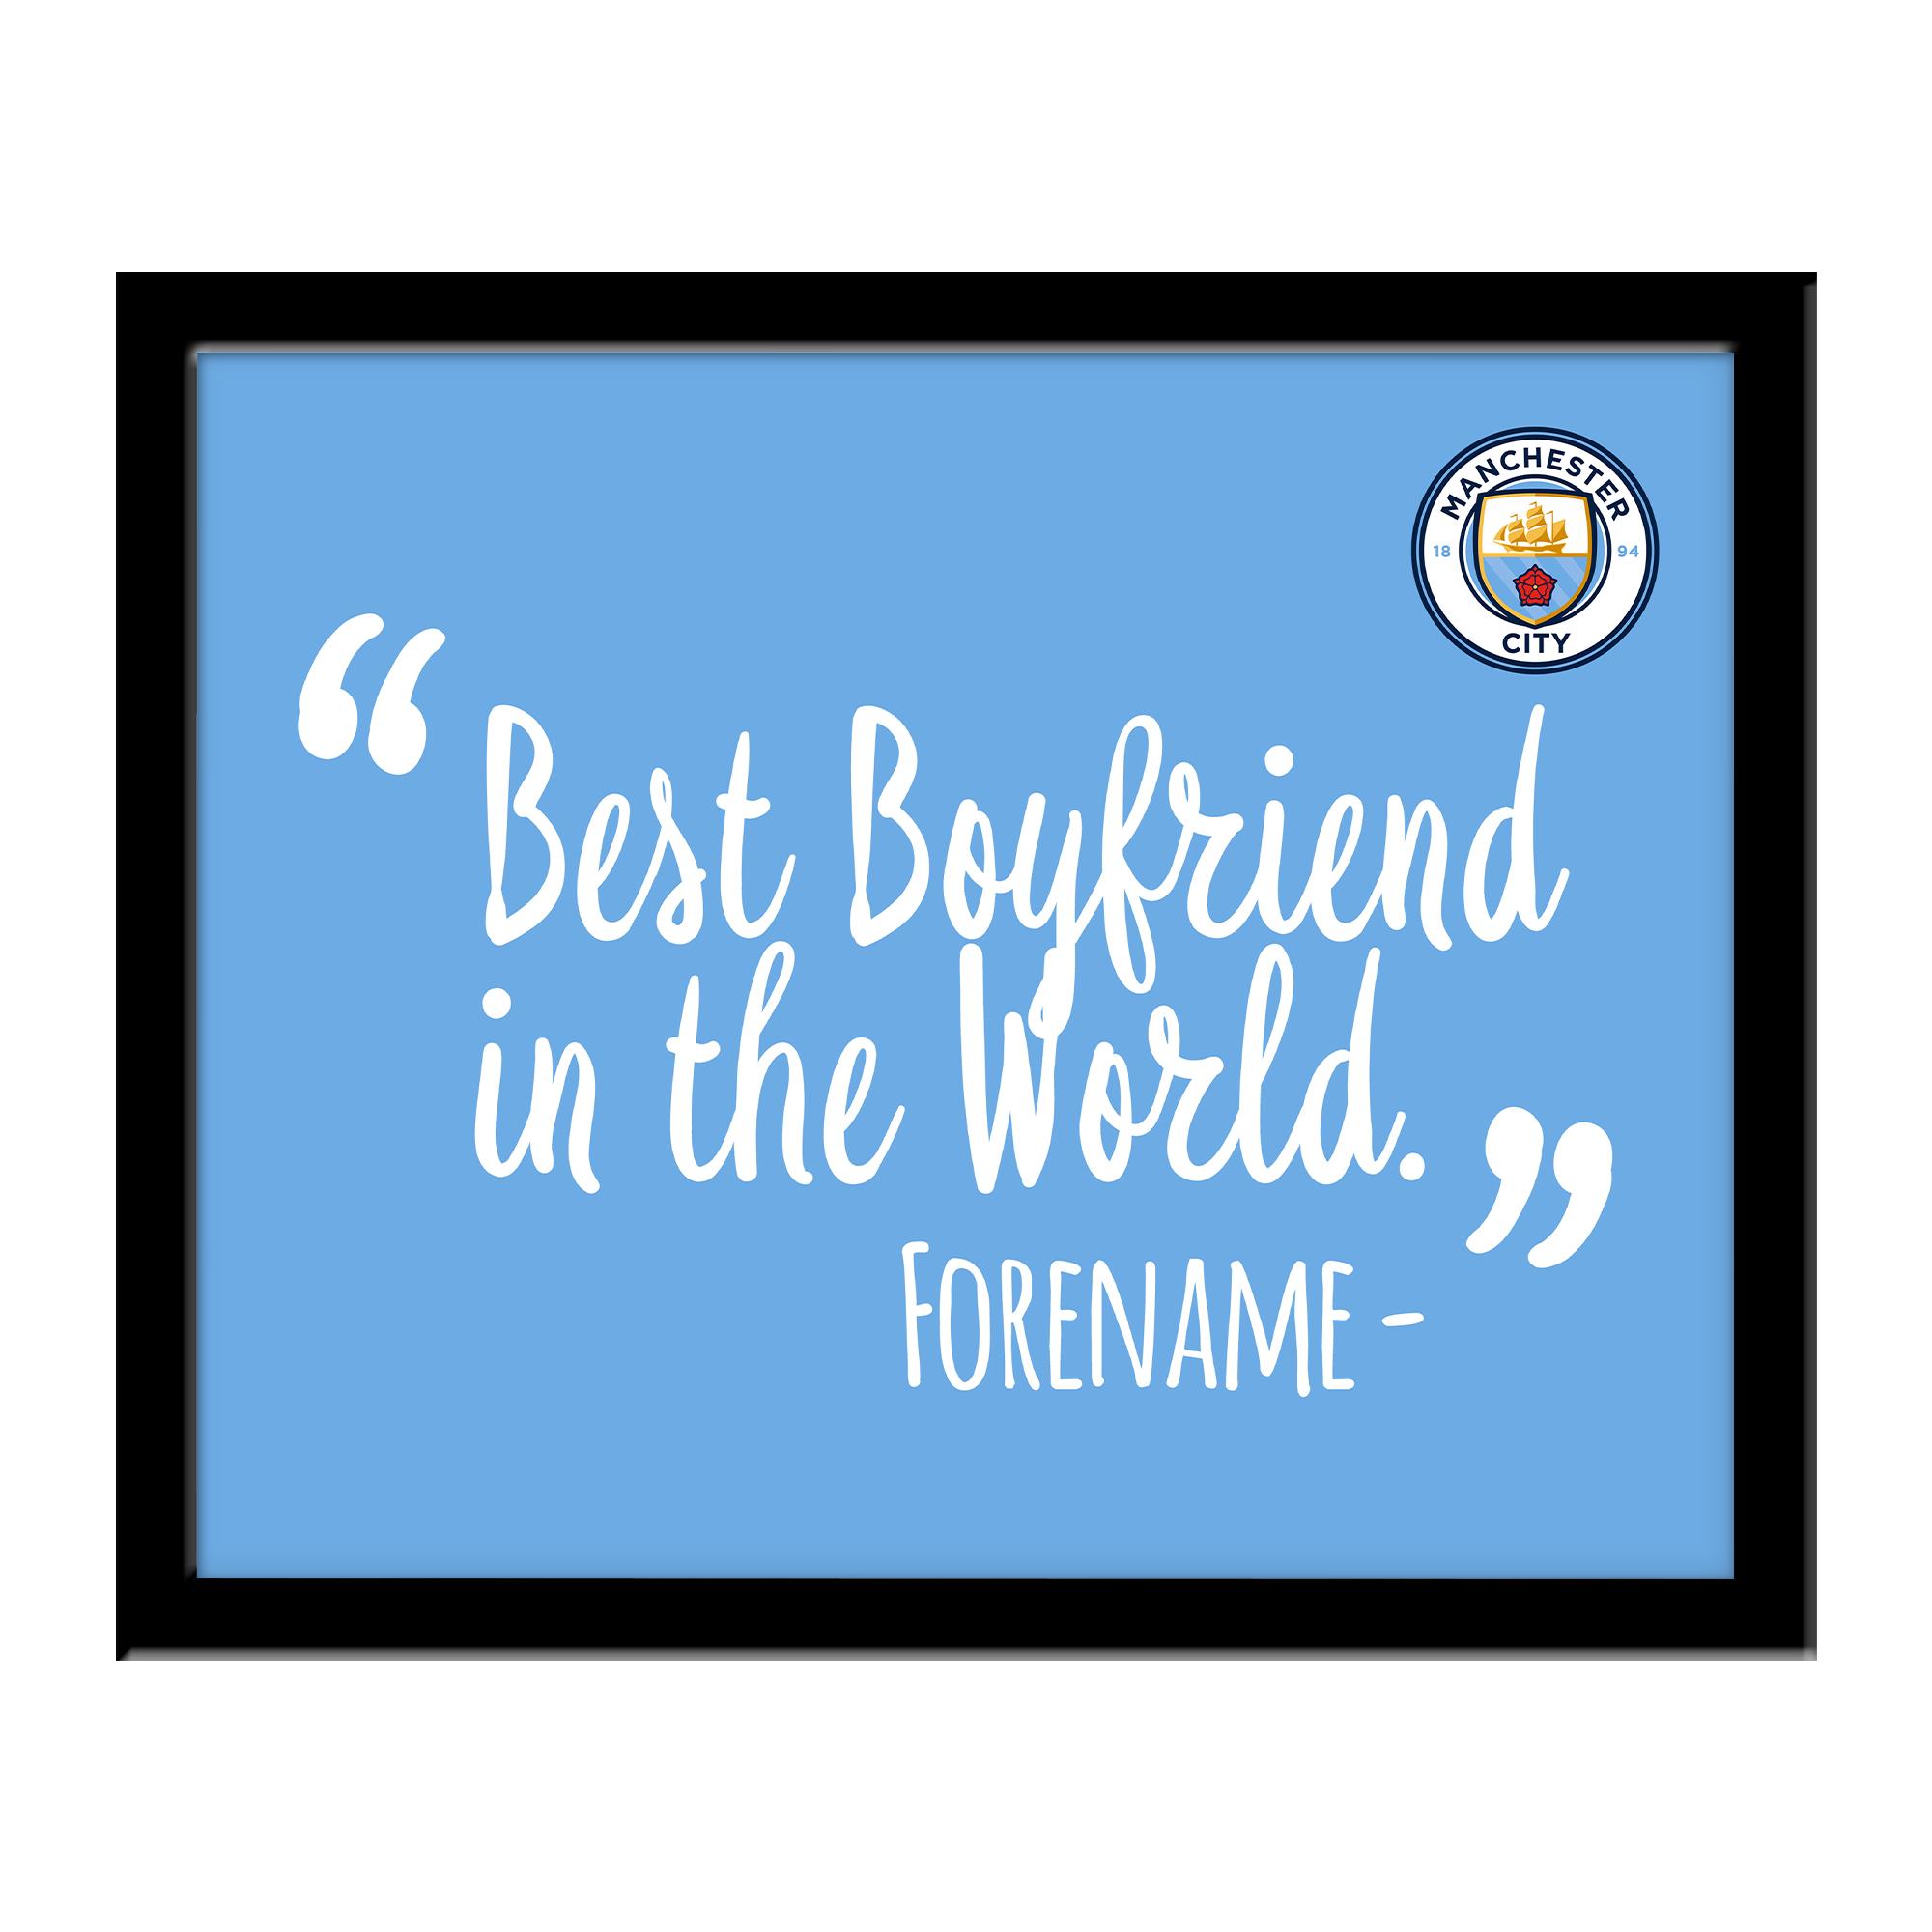 Manchester City FC Best Boyfriend In The World 10 x 8 Photo Framed